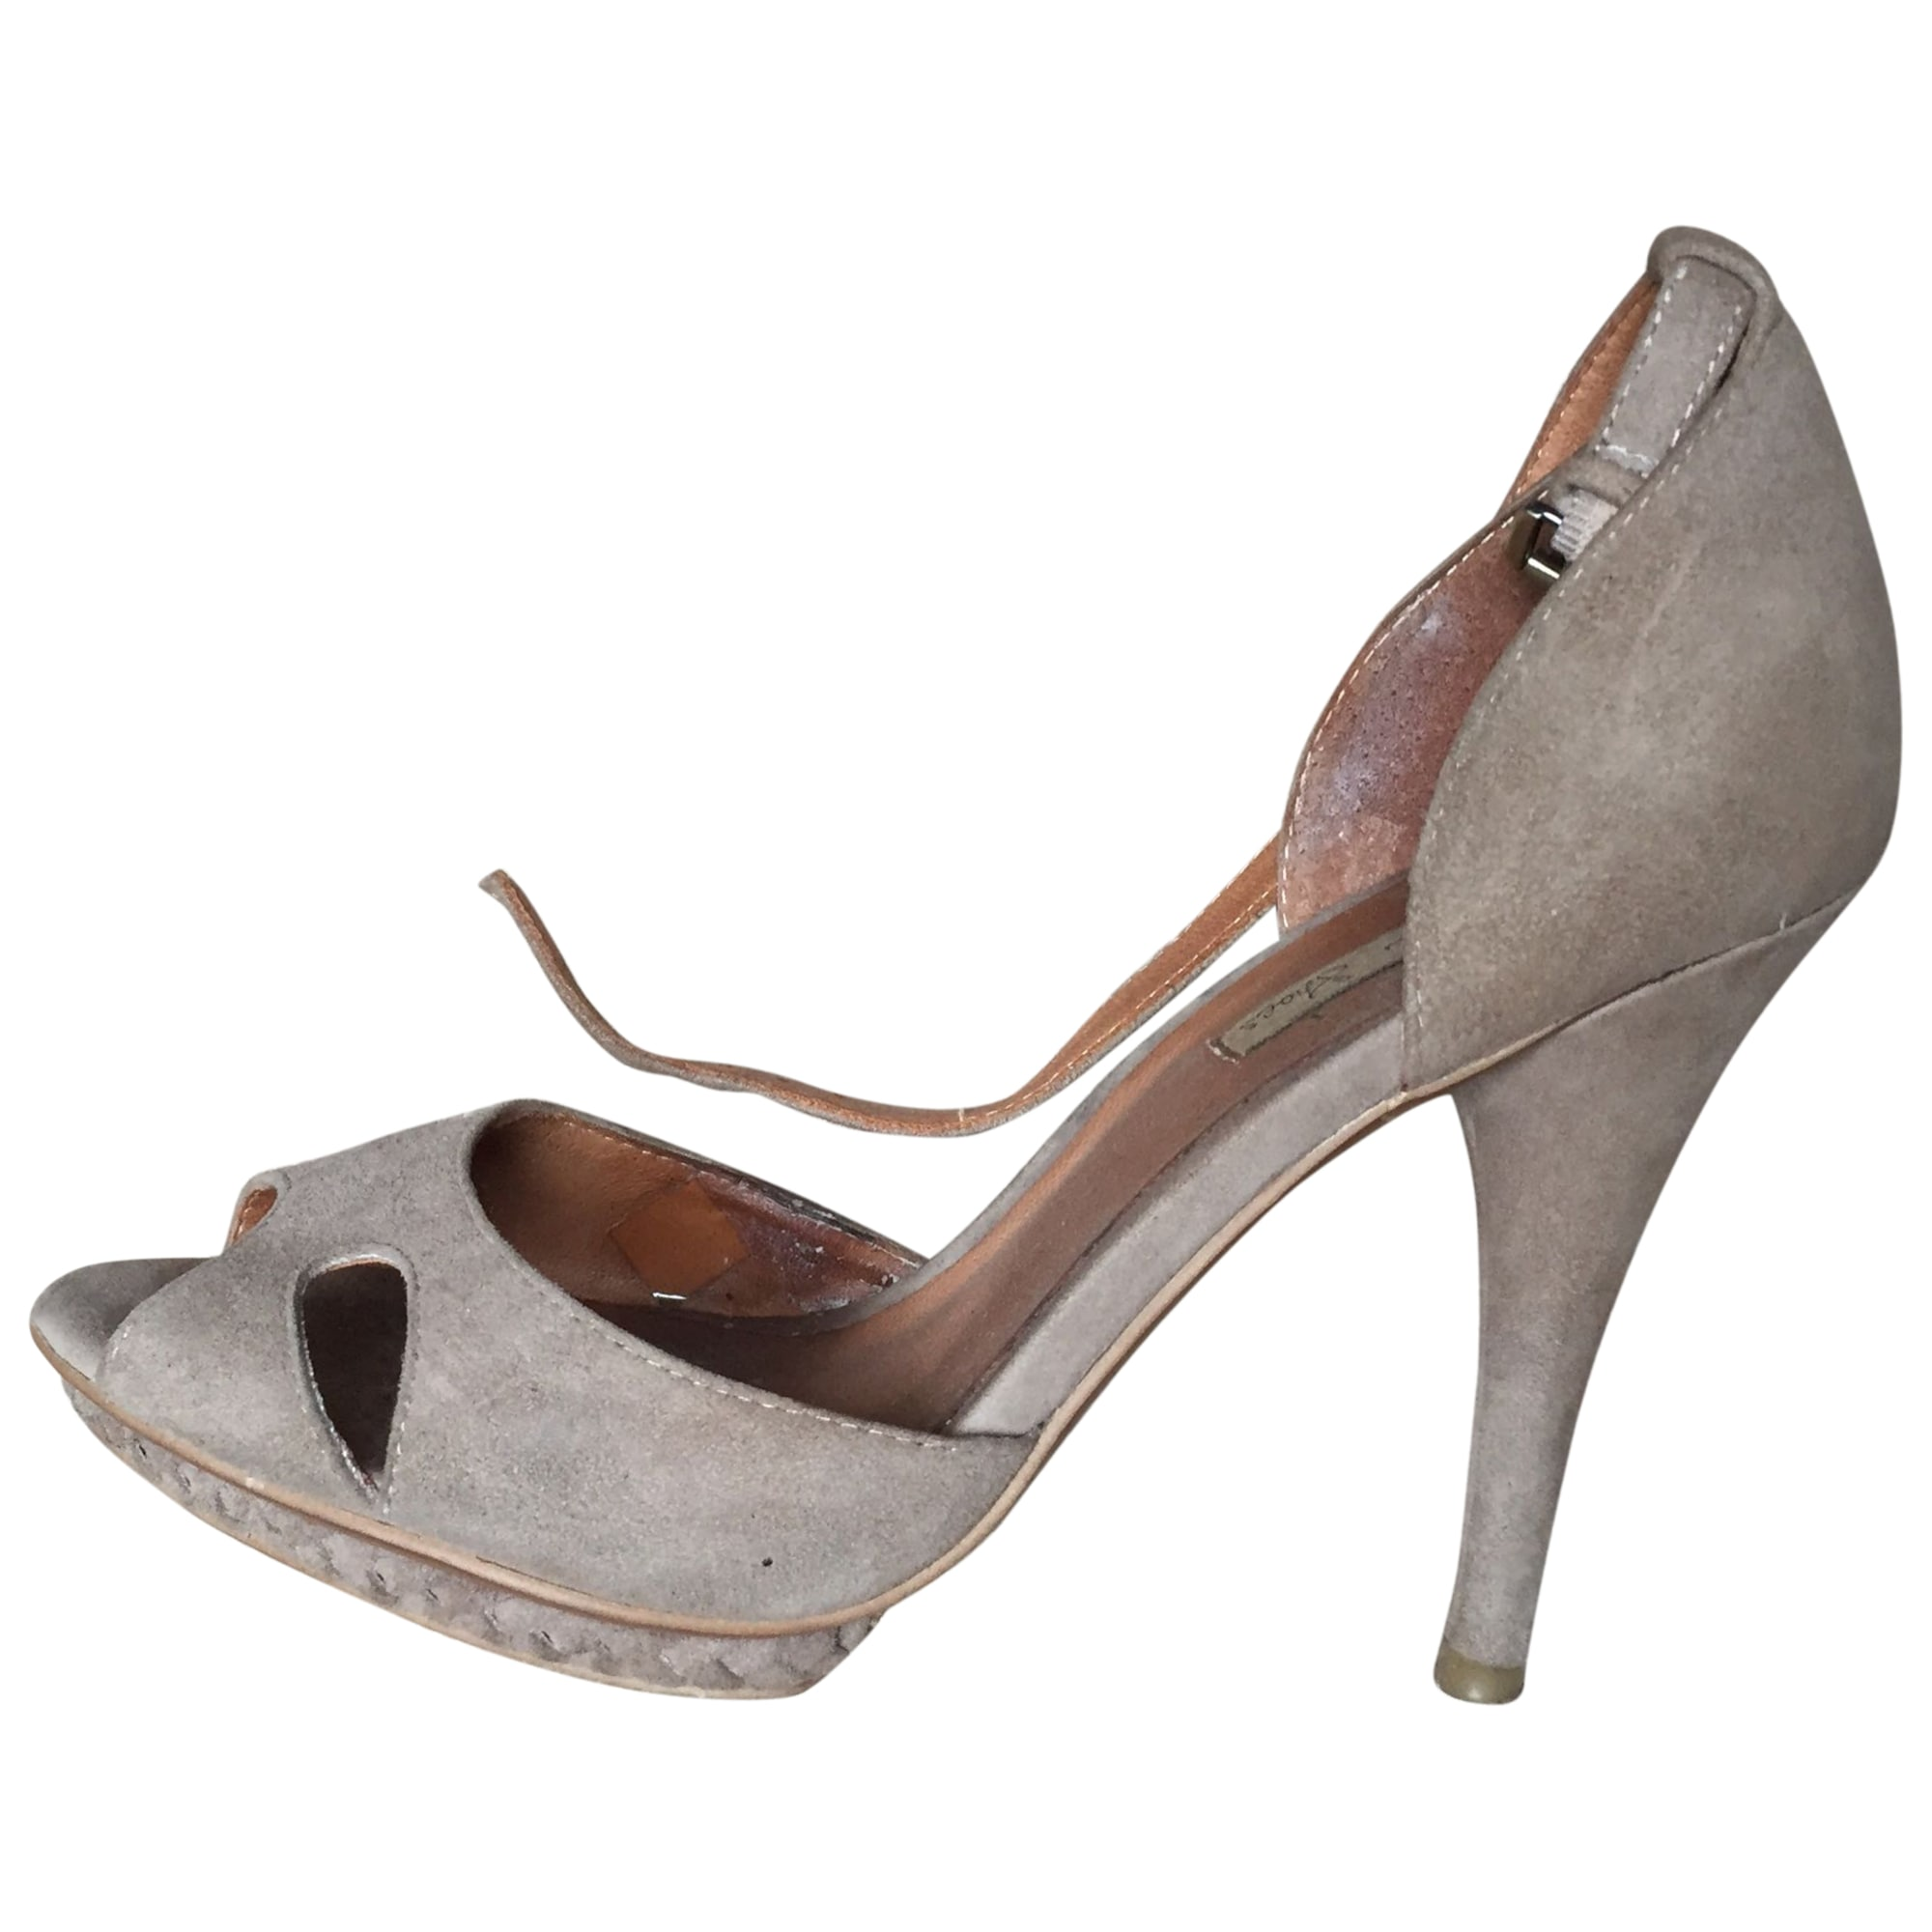 Sandales à talons TOSCA BLU Beige, camel